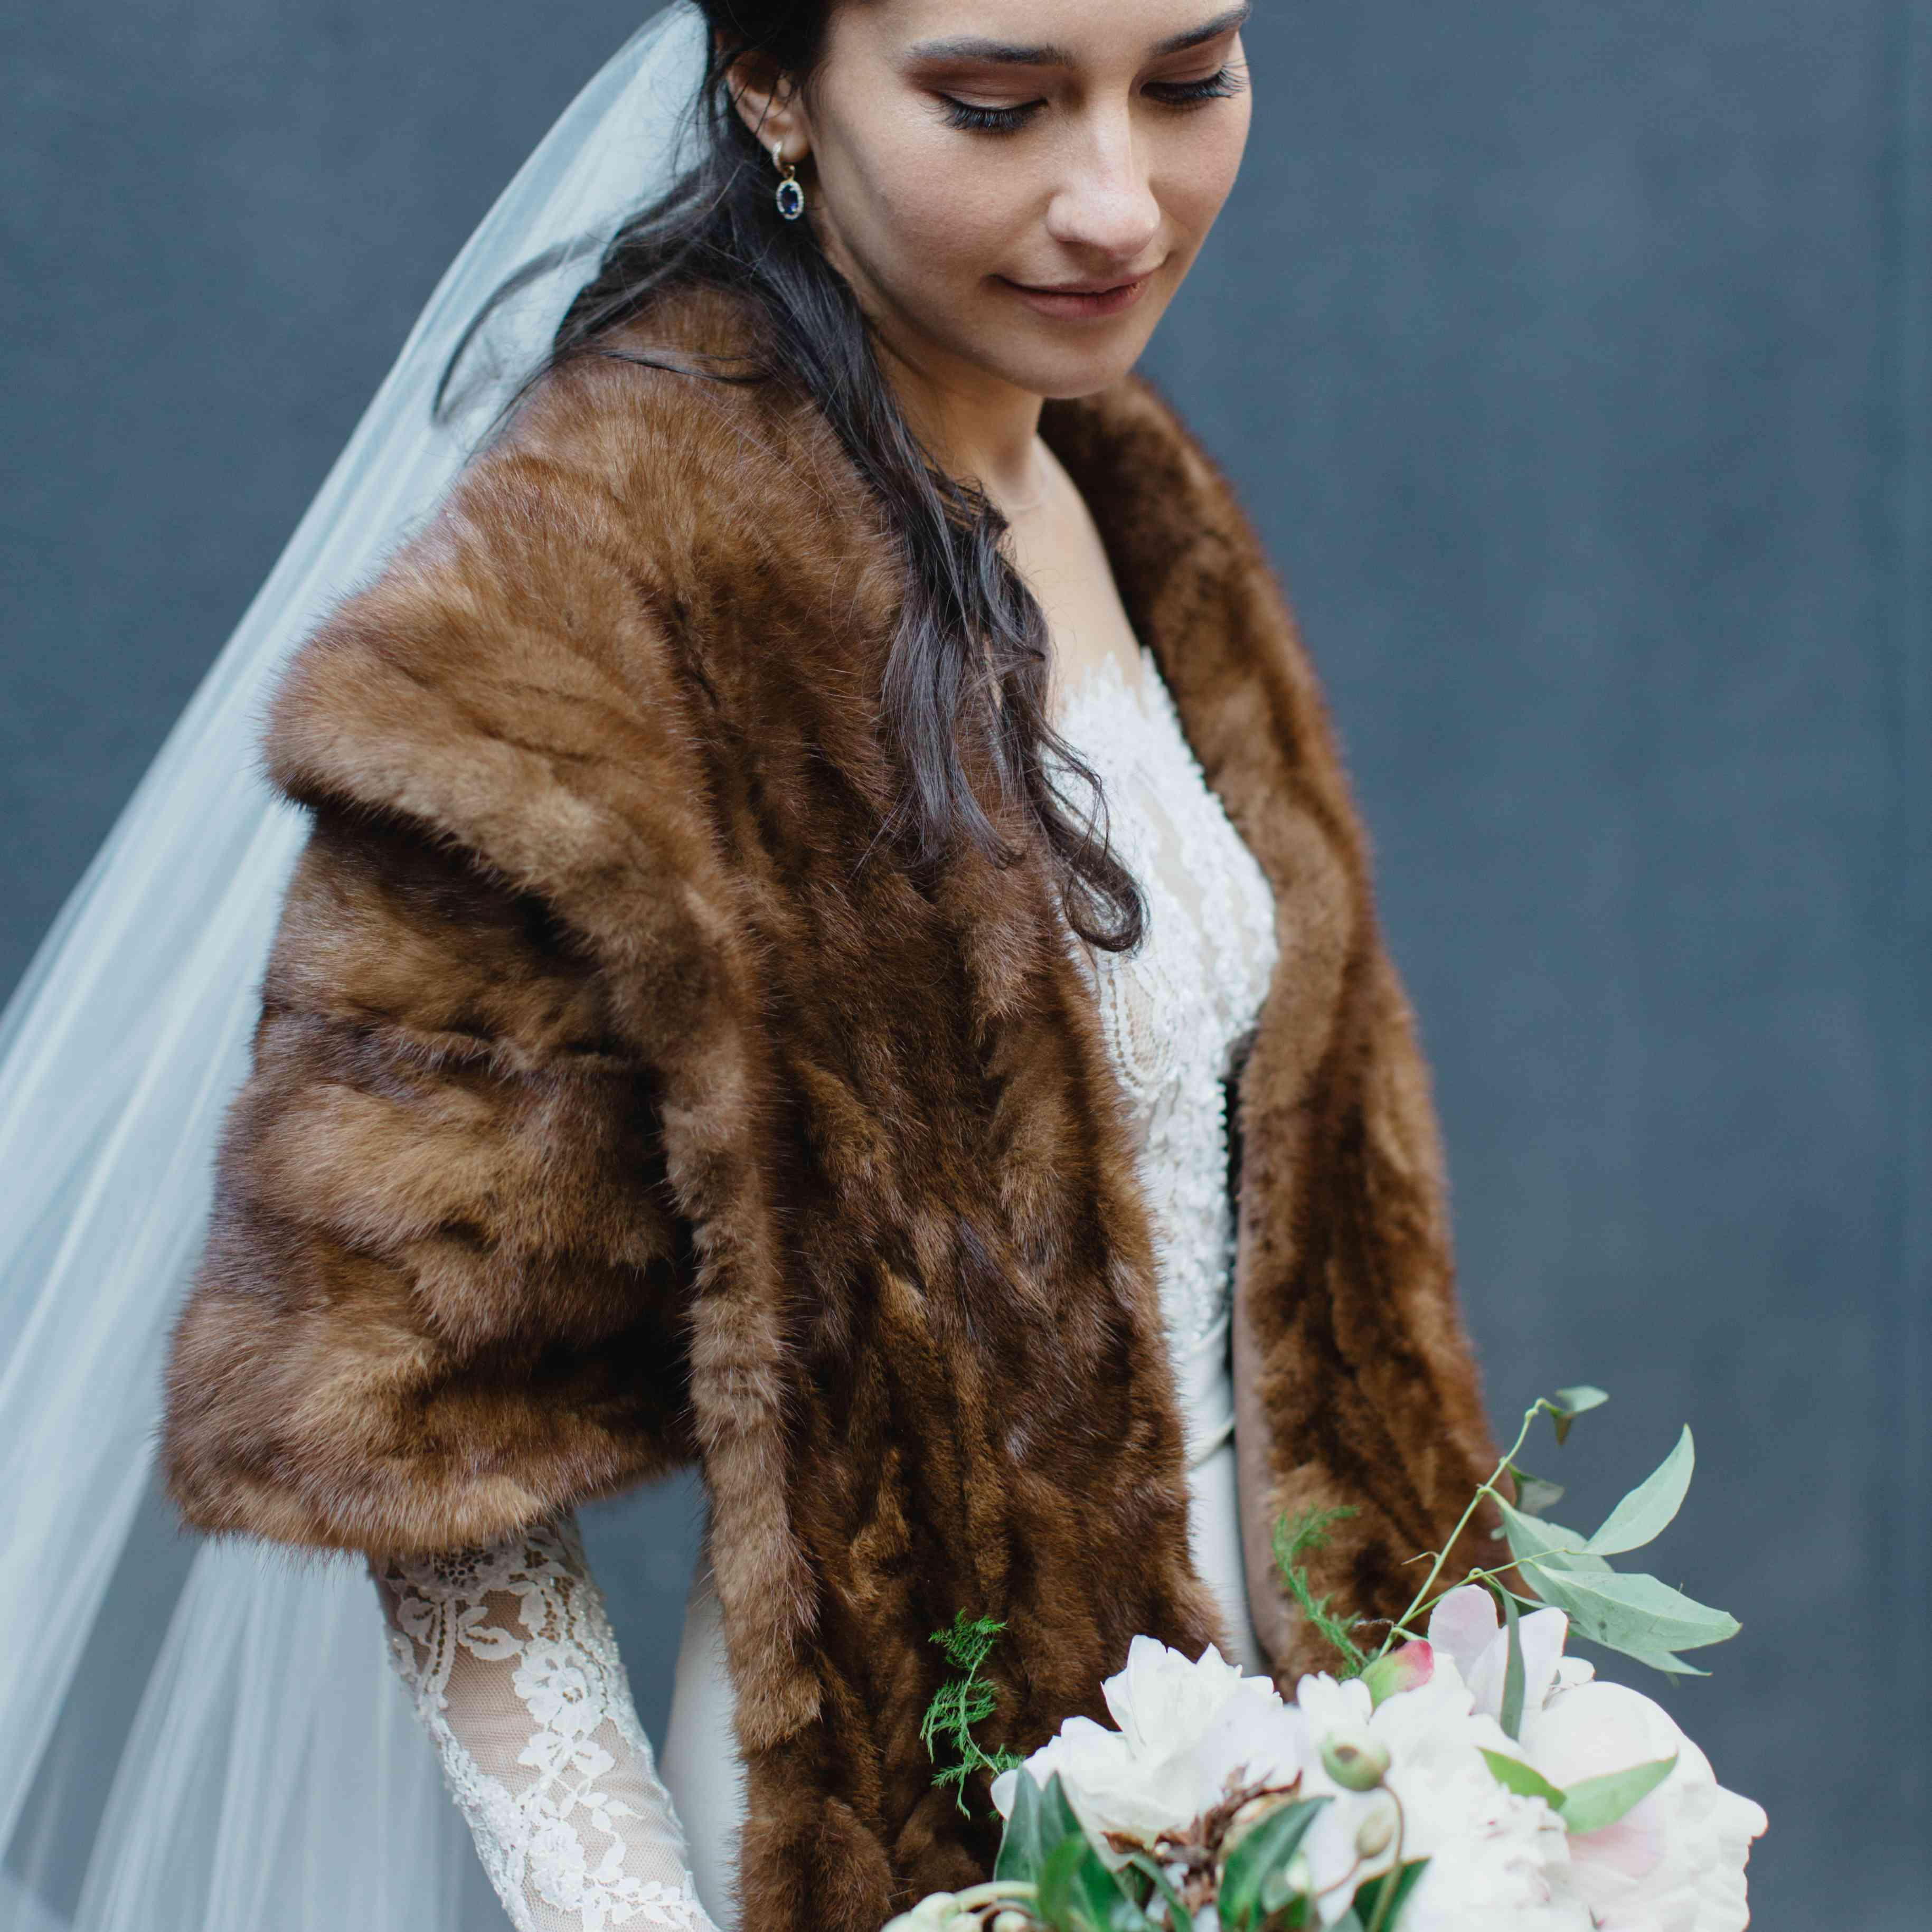 Bride wearing fur shawl